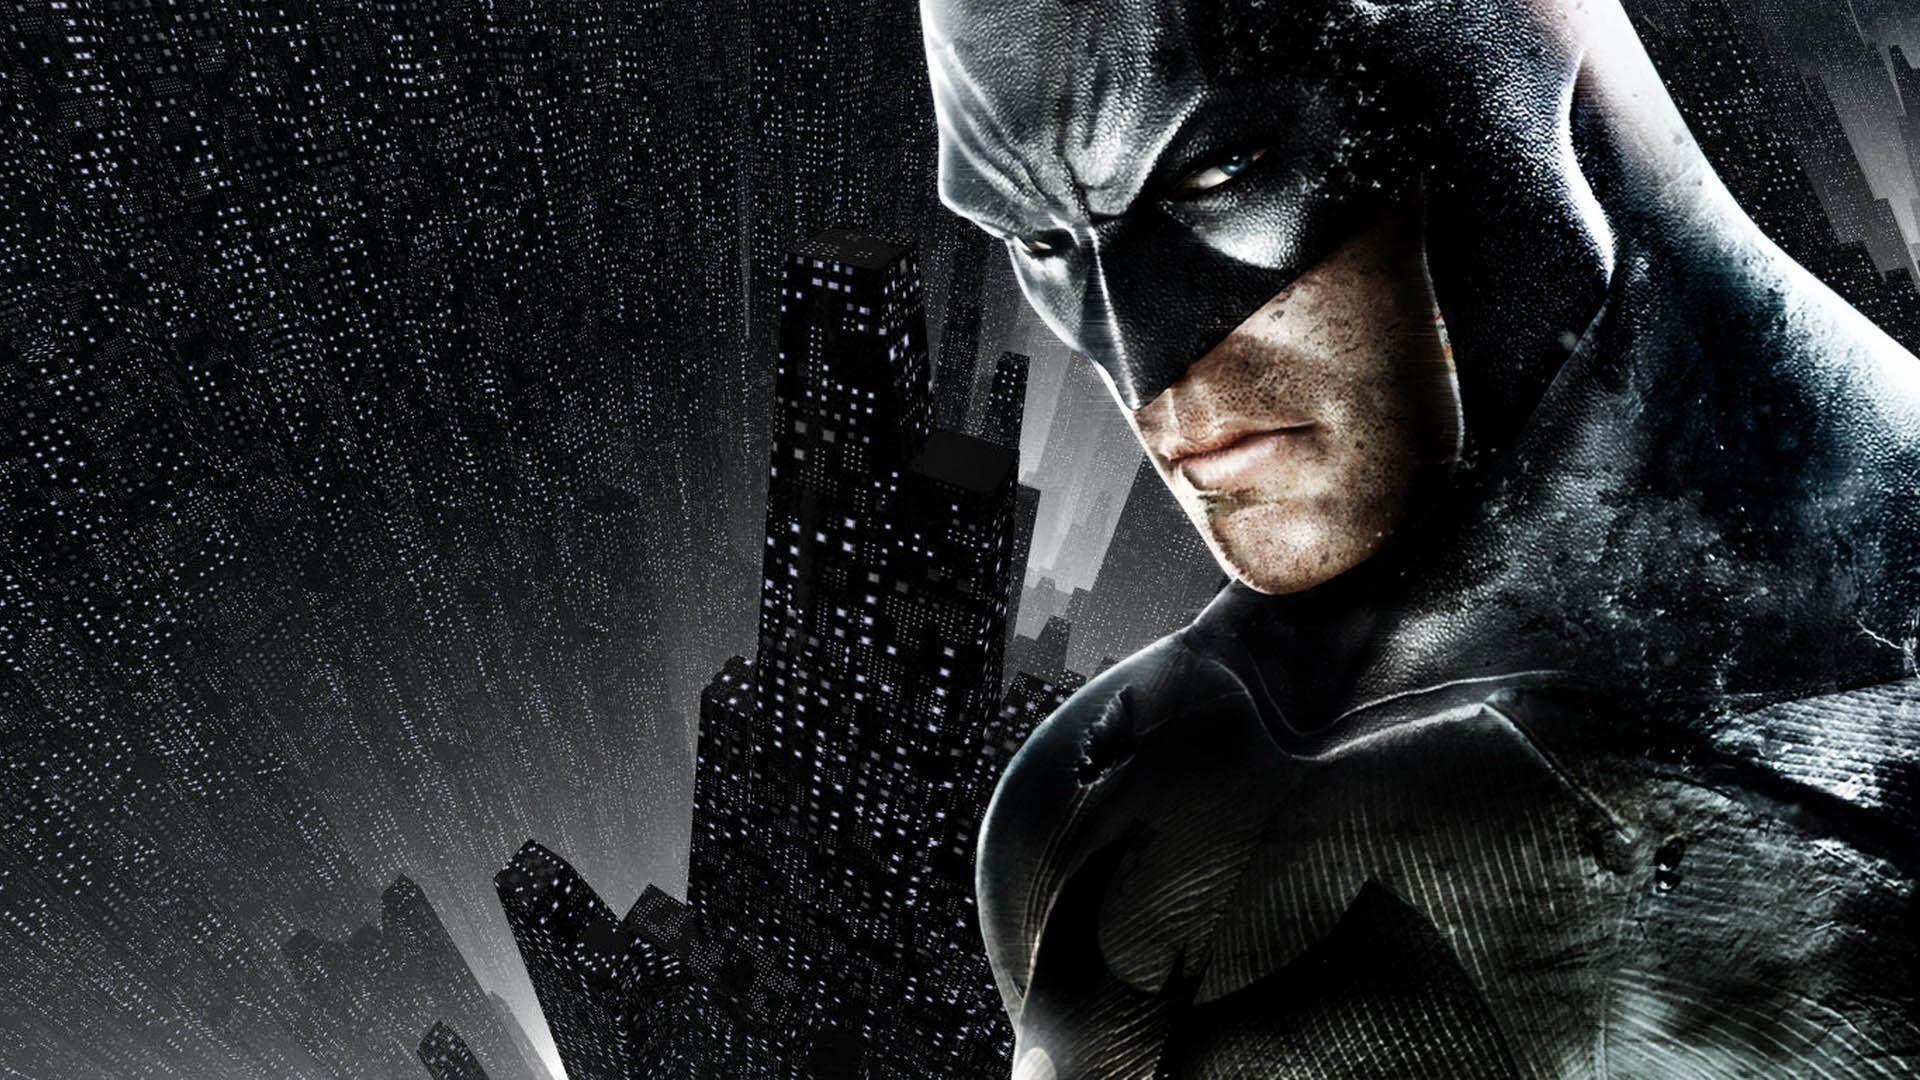 1920x1080 Full Hd 1080p Batman Arkham City Wallpapers Hd Desktop Batman Wallpaper Marvel Wallpaper Batman